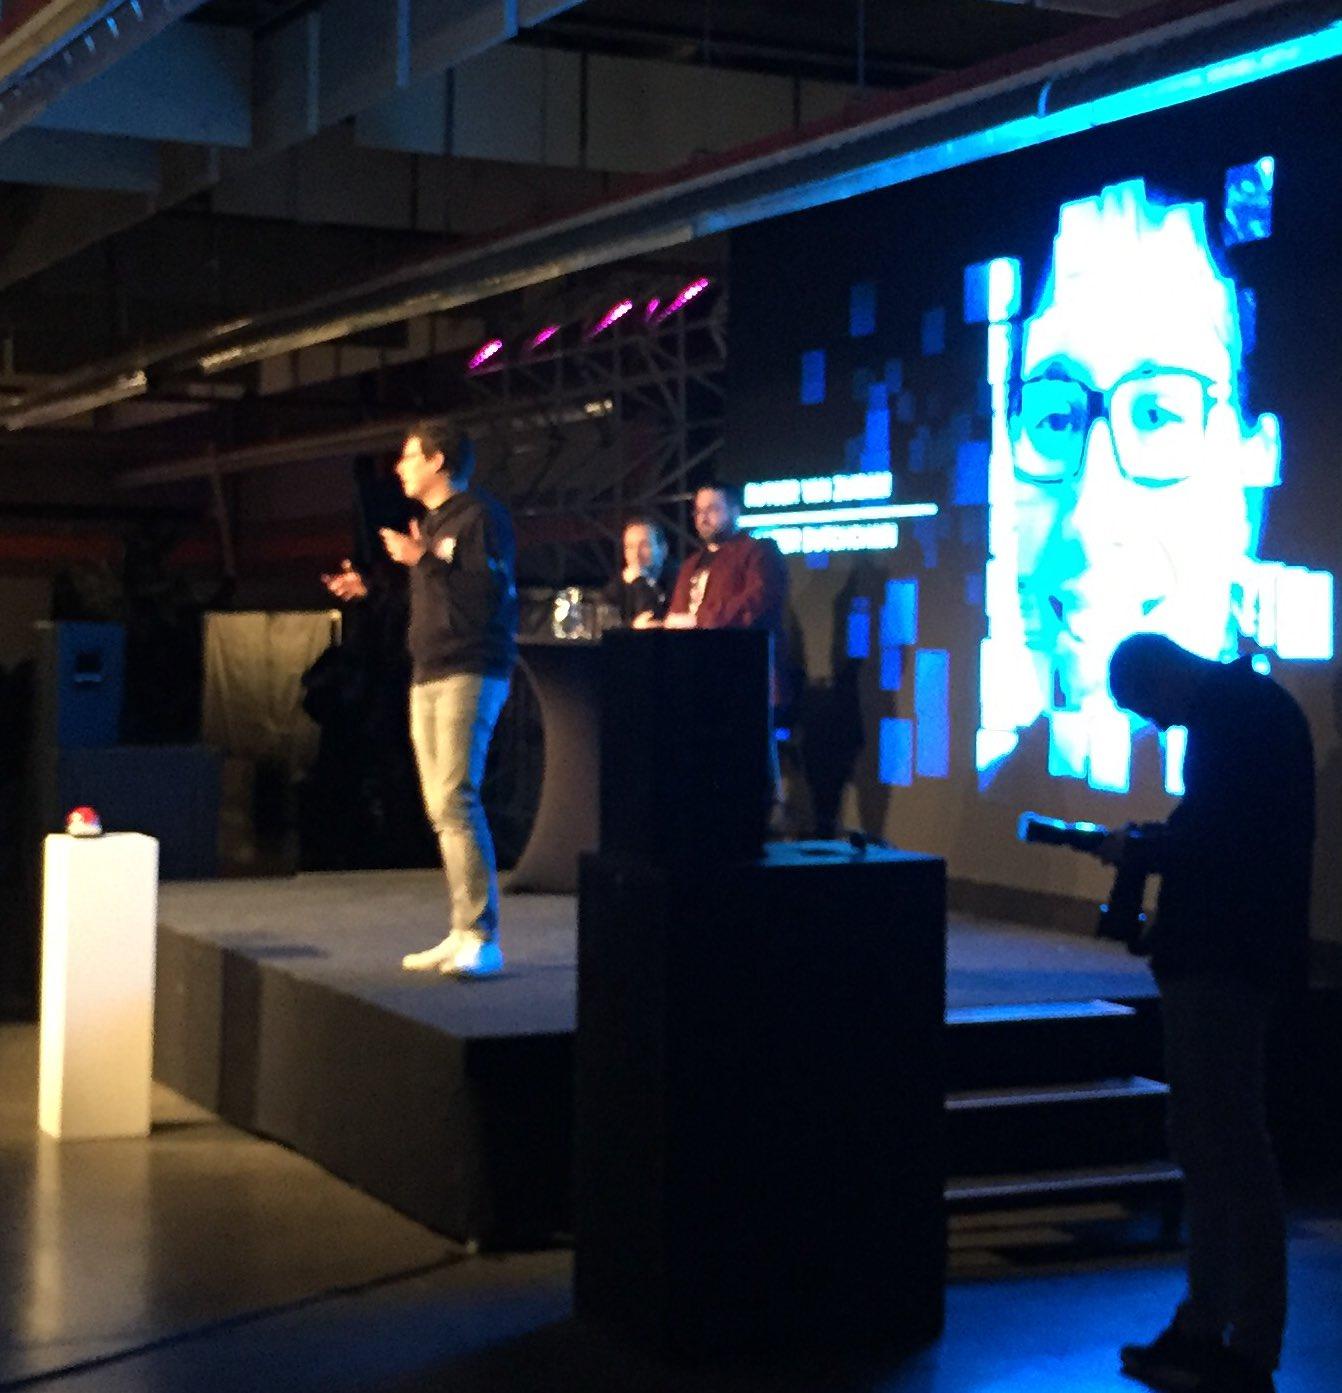 "Rutger (@rutgervz) at opening of the #dbh17 hackathon ""it's f#ing amazing"" https://t.co/b5Eg5oNkdx"